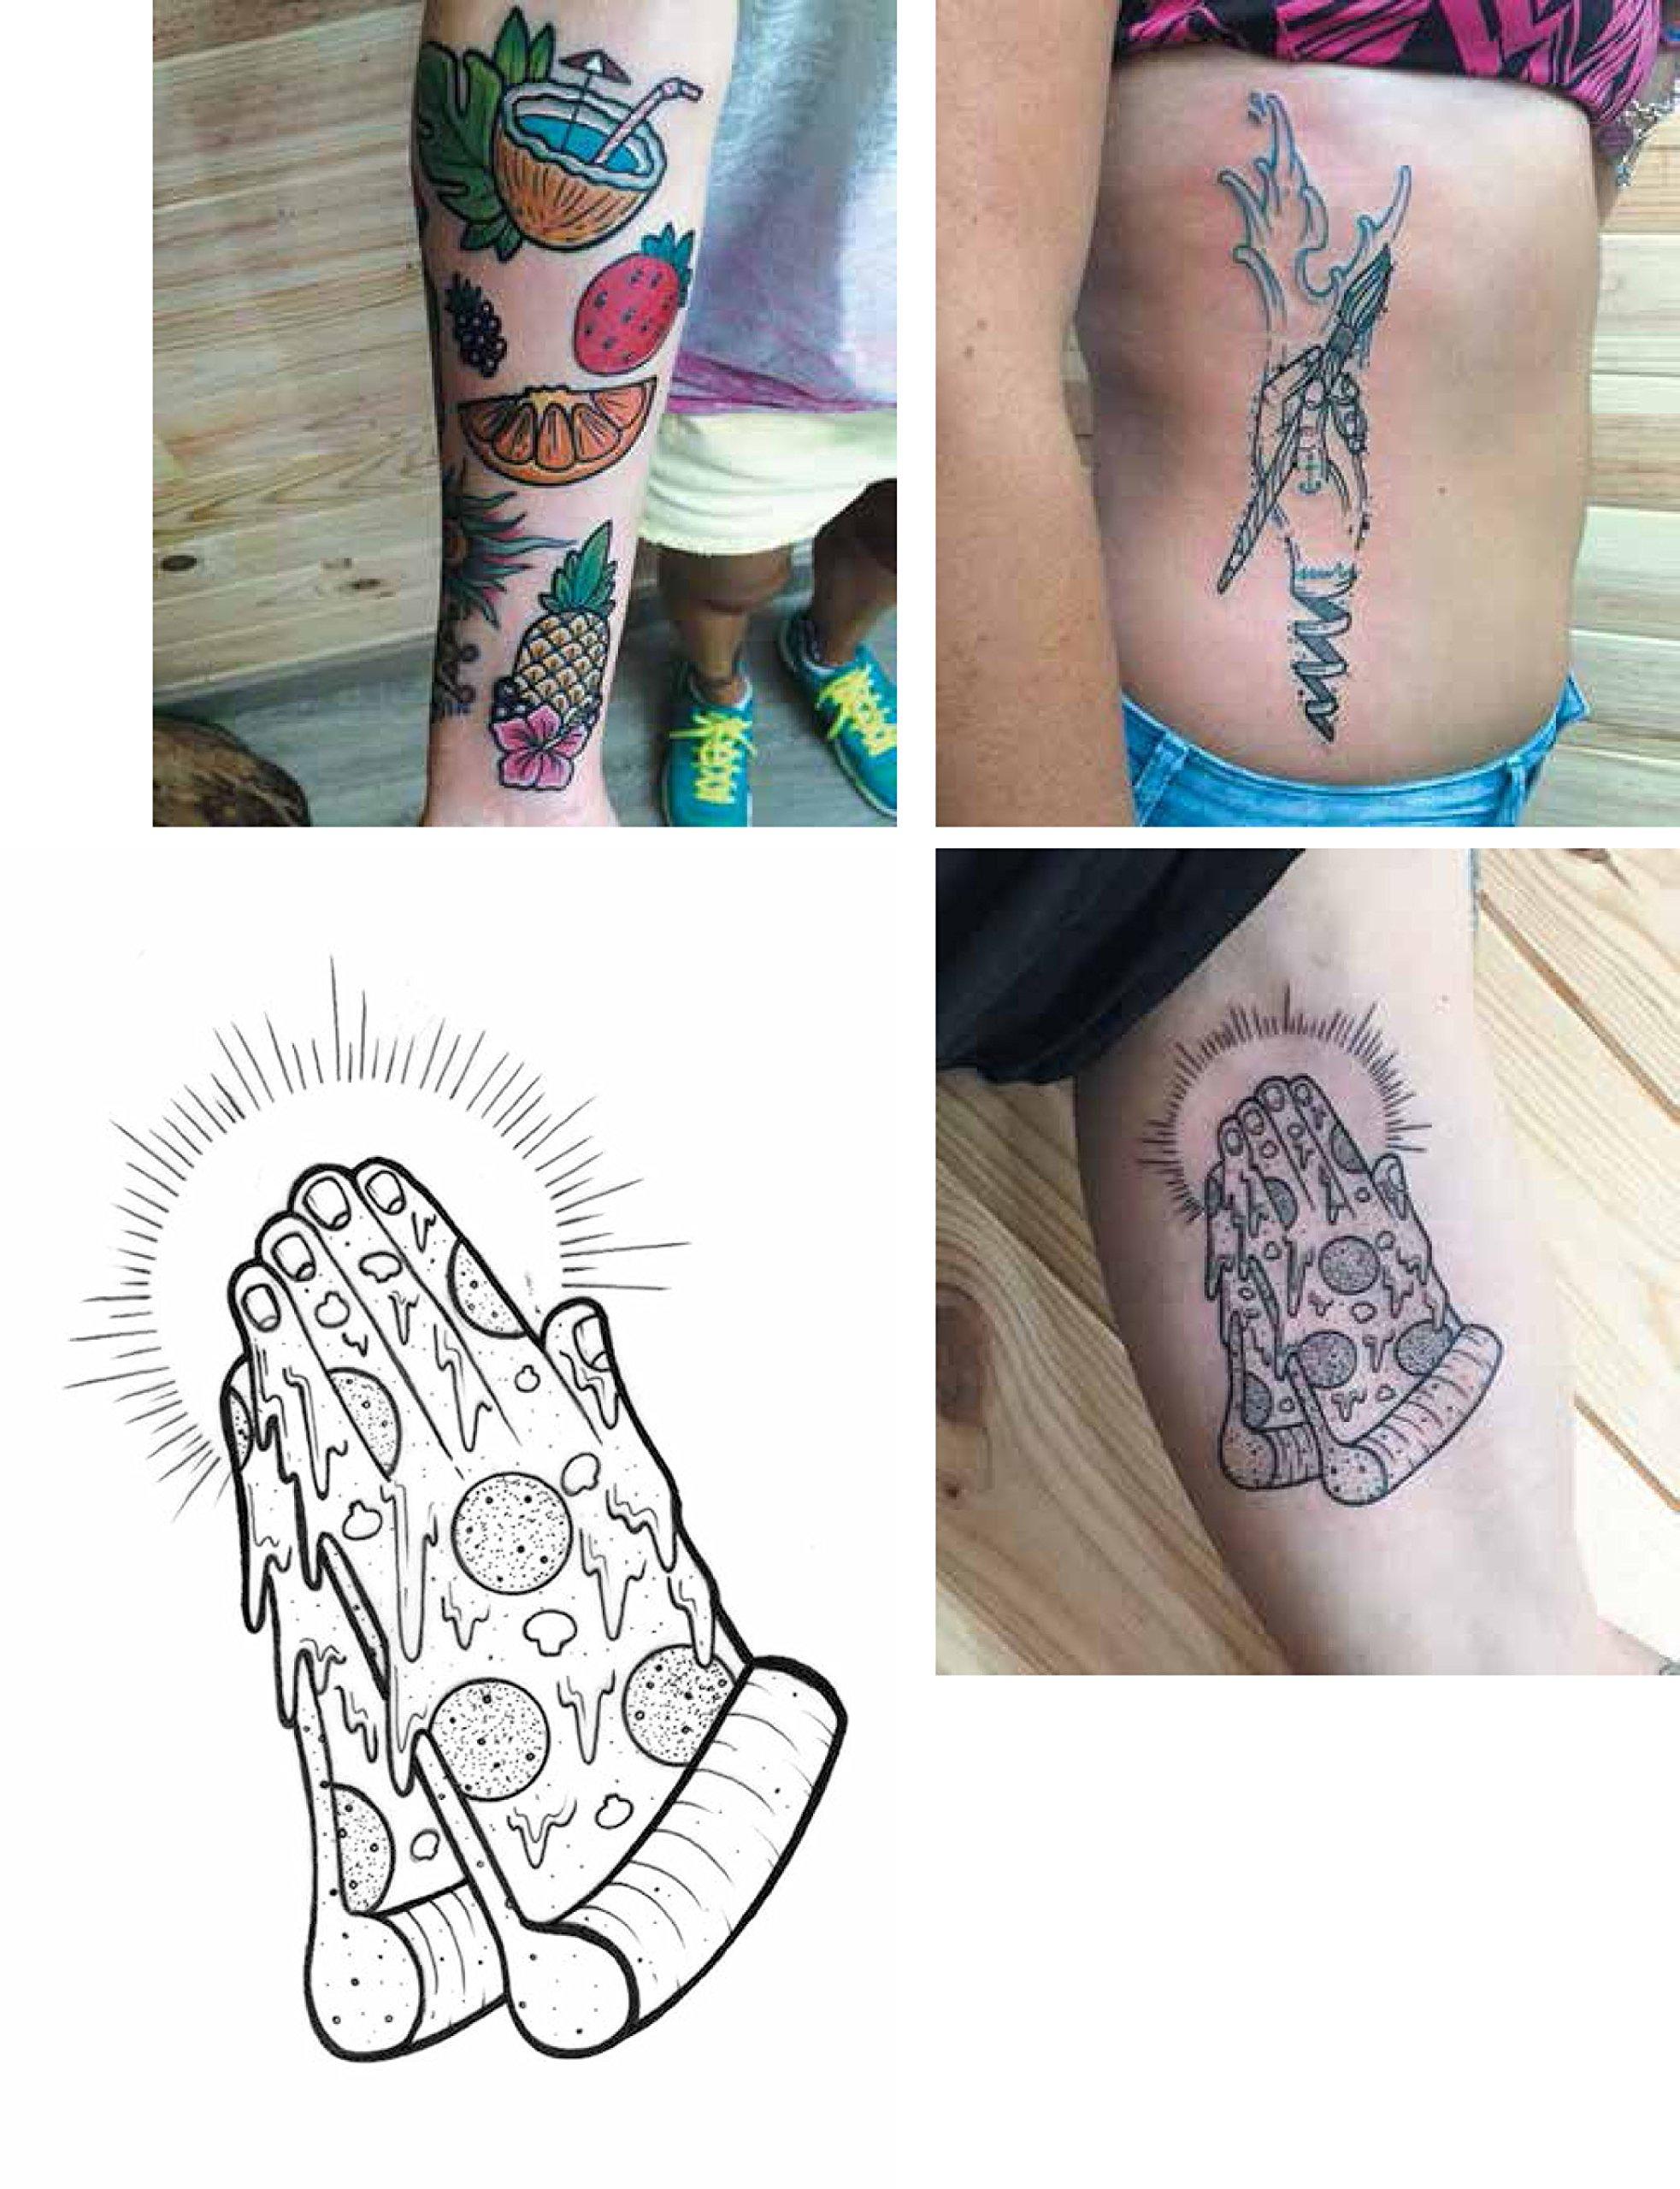 The New Tattoo: Amazon.es: Instituto Monsa de Ediciones, S.A.: Libros